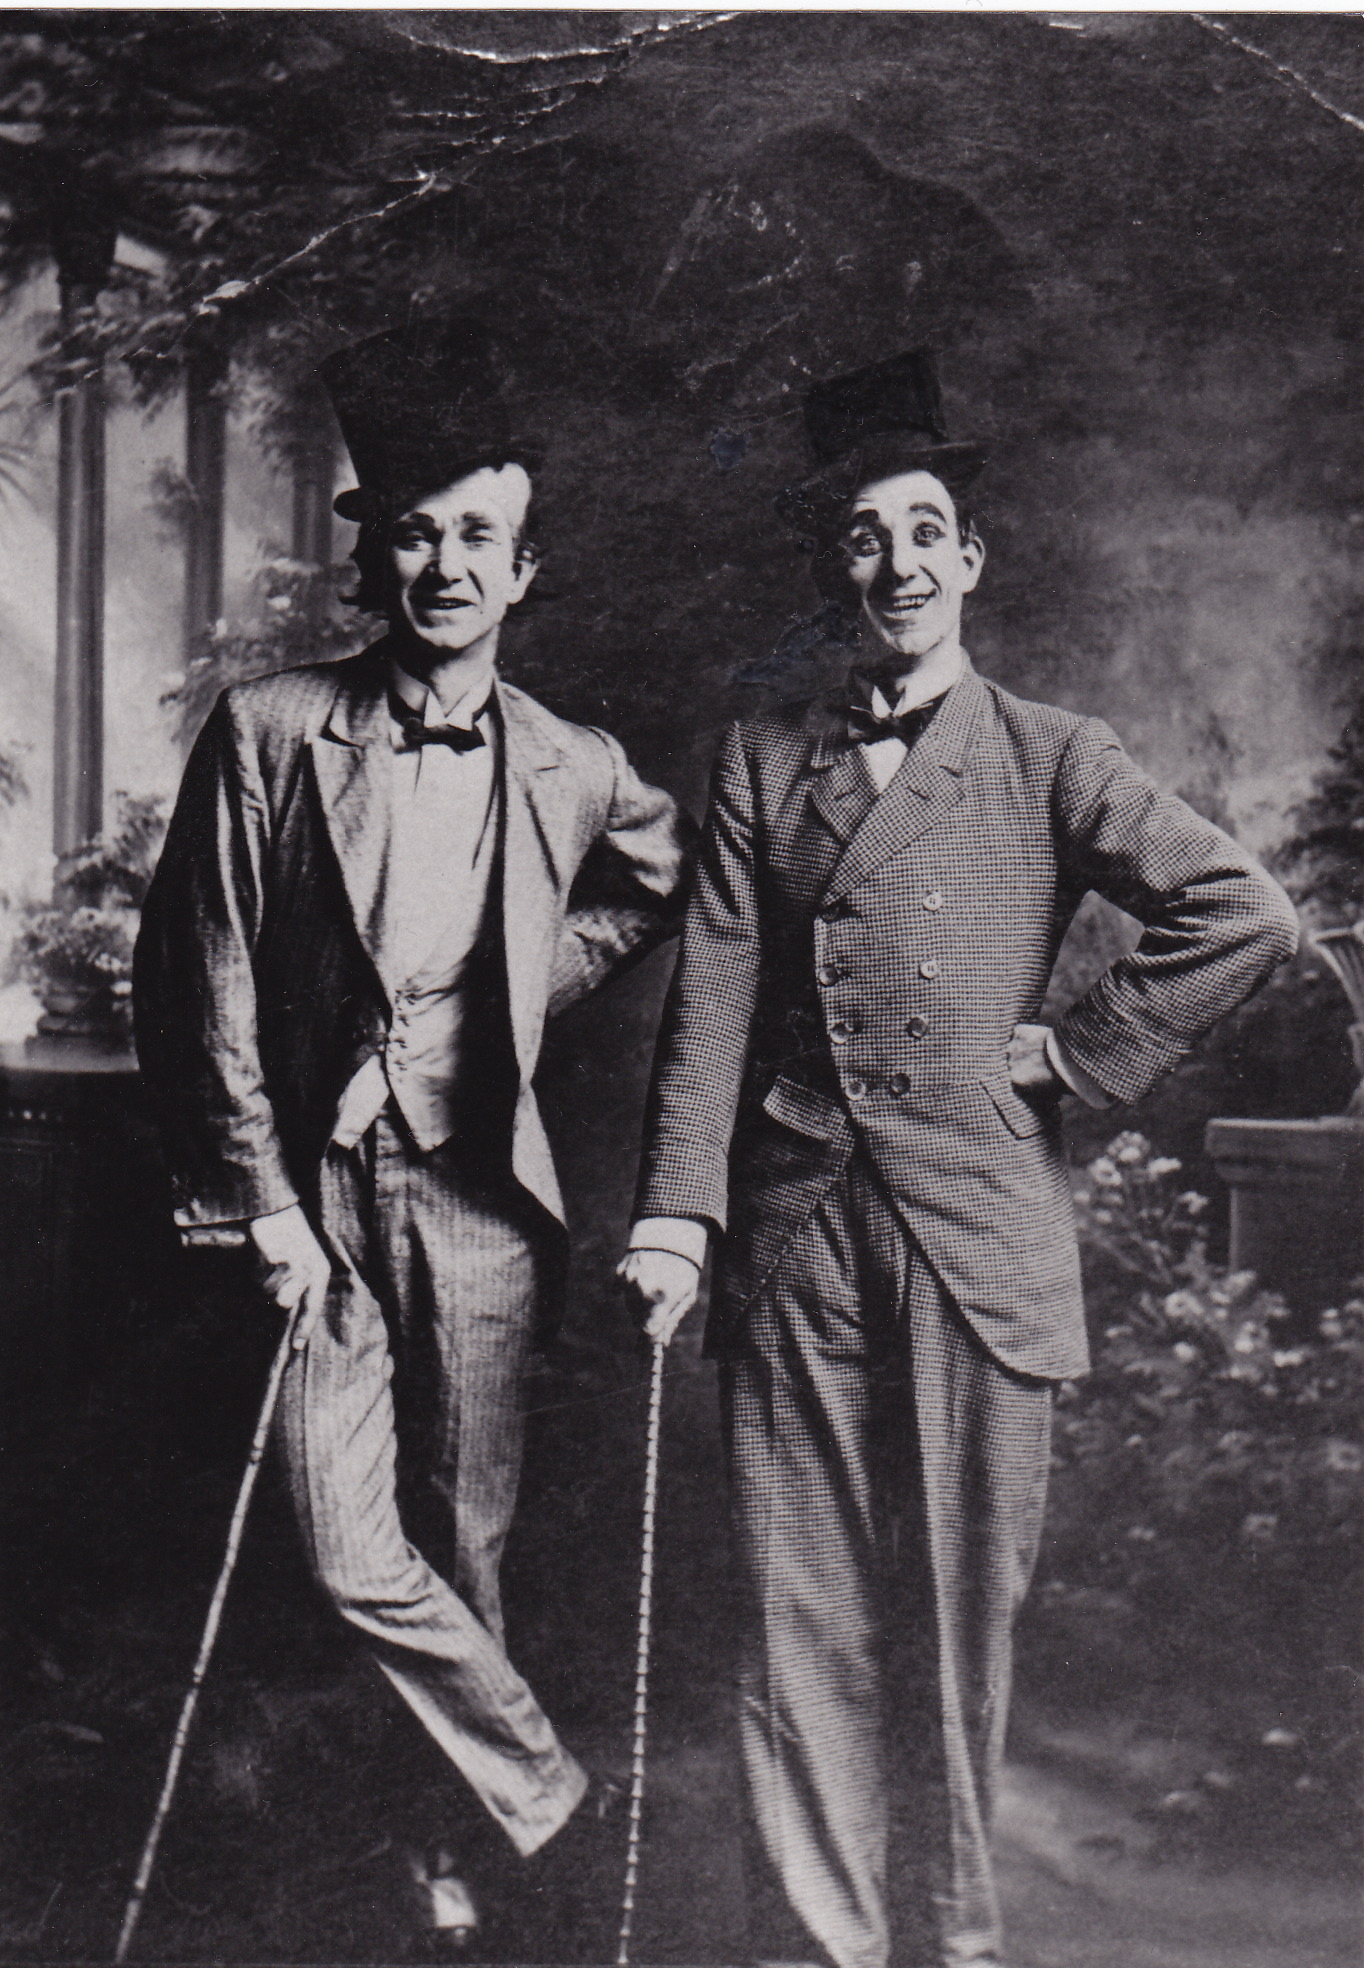 The Hanaway Brothers